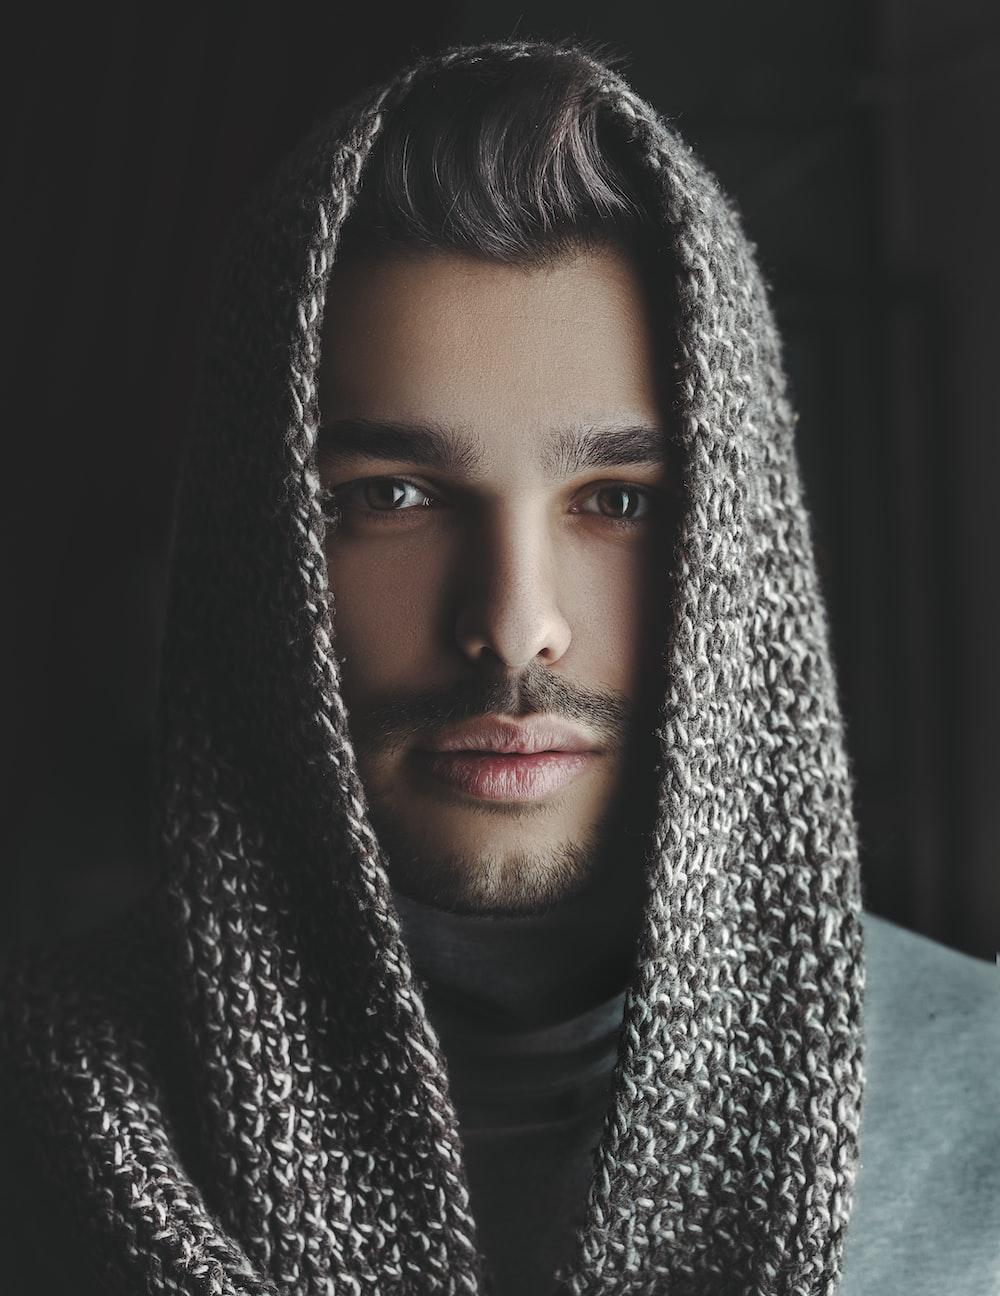 man wearing gray headscarf